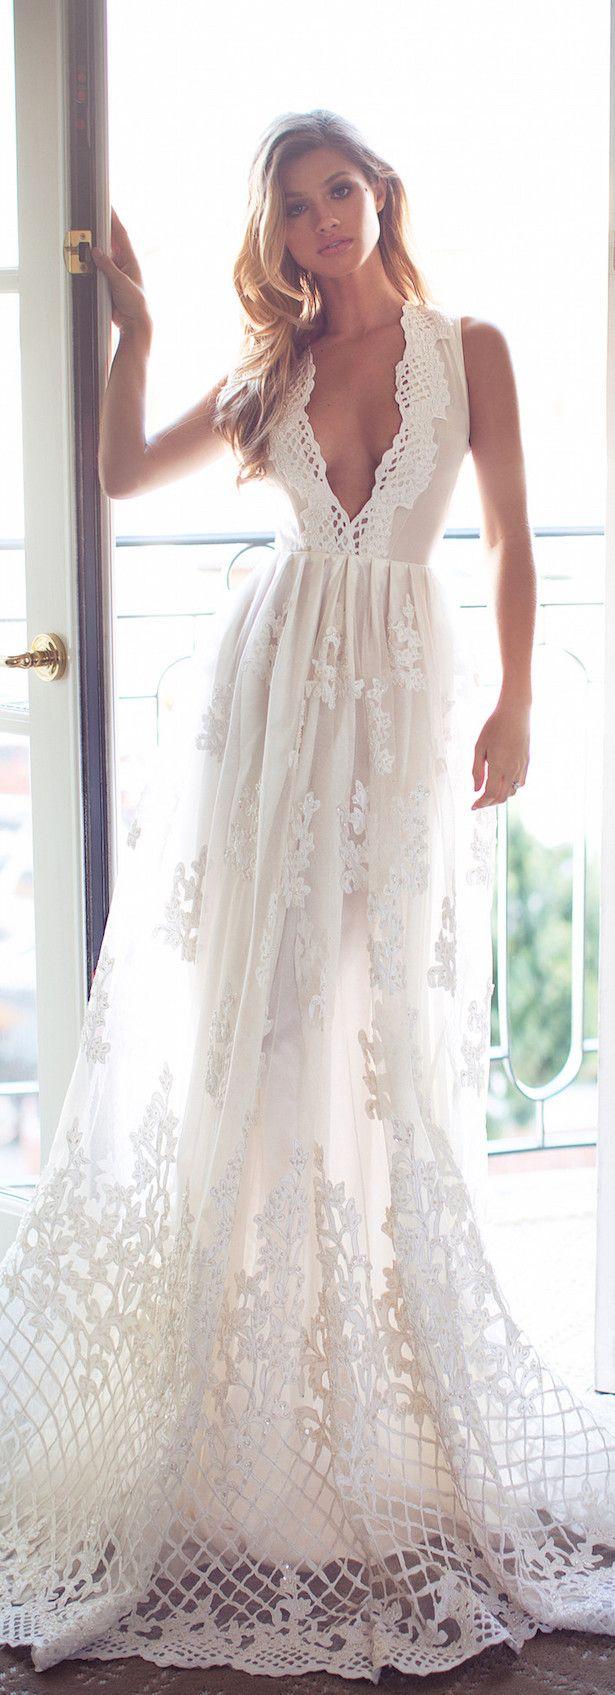 d43f5d4772d Lurelly Bridal | γάμος | Νυφικά, Ιδέες γάμου, Νυφική συλλογή